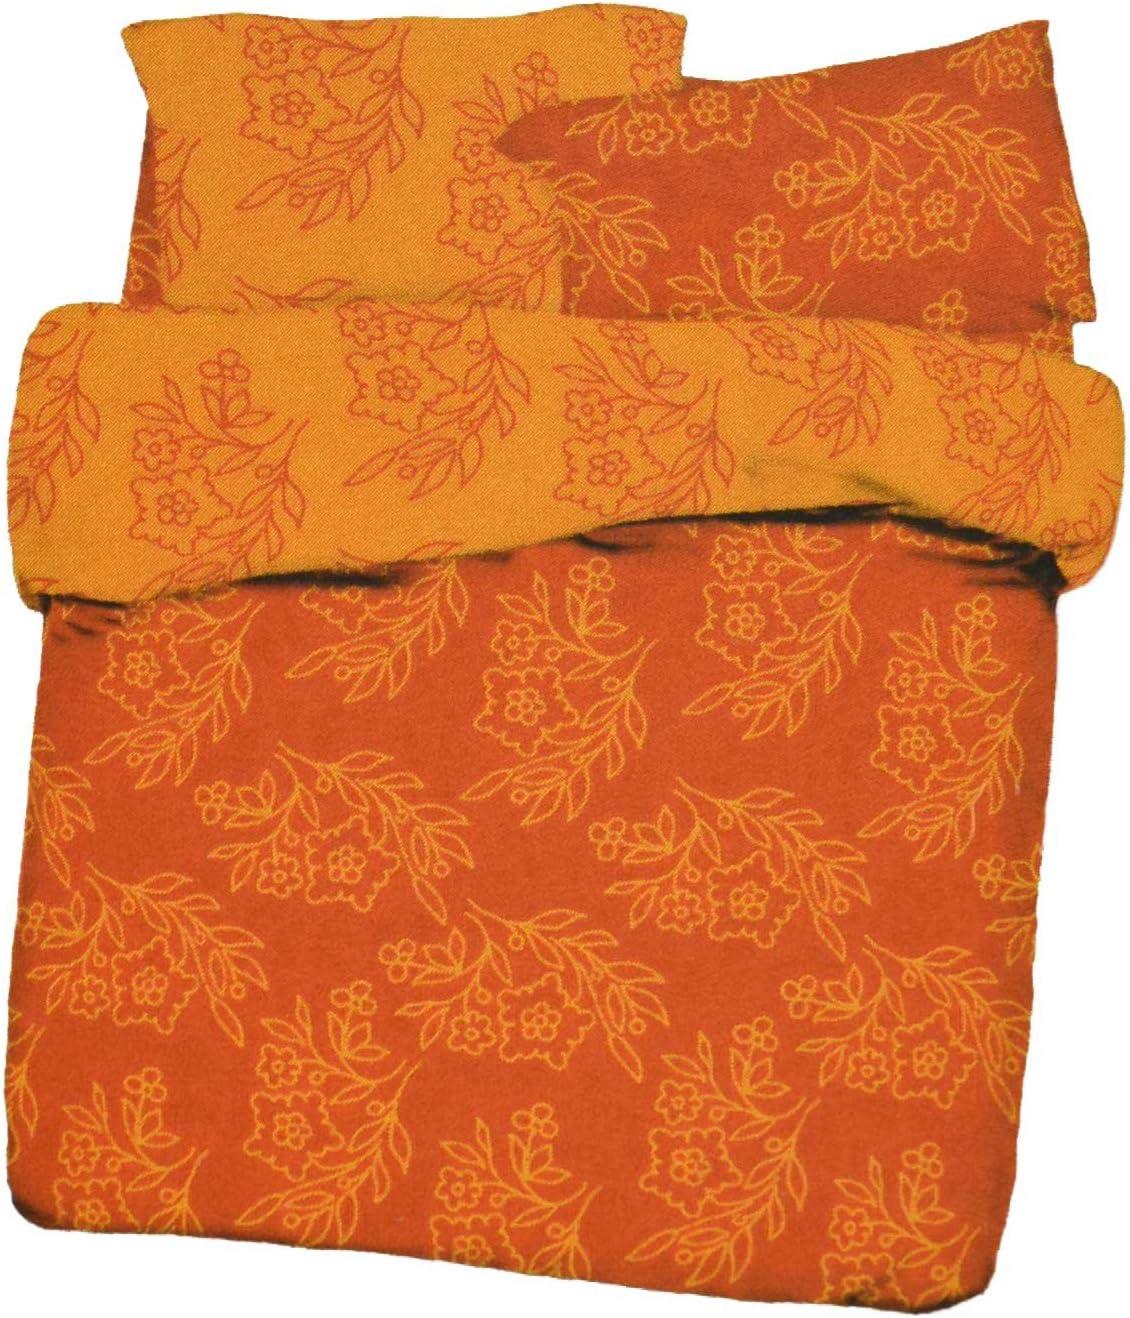 Copripiumino 155x200.Amazon Com Daunex Copripiumino Sacco Singolo Arancio Fiori